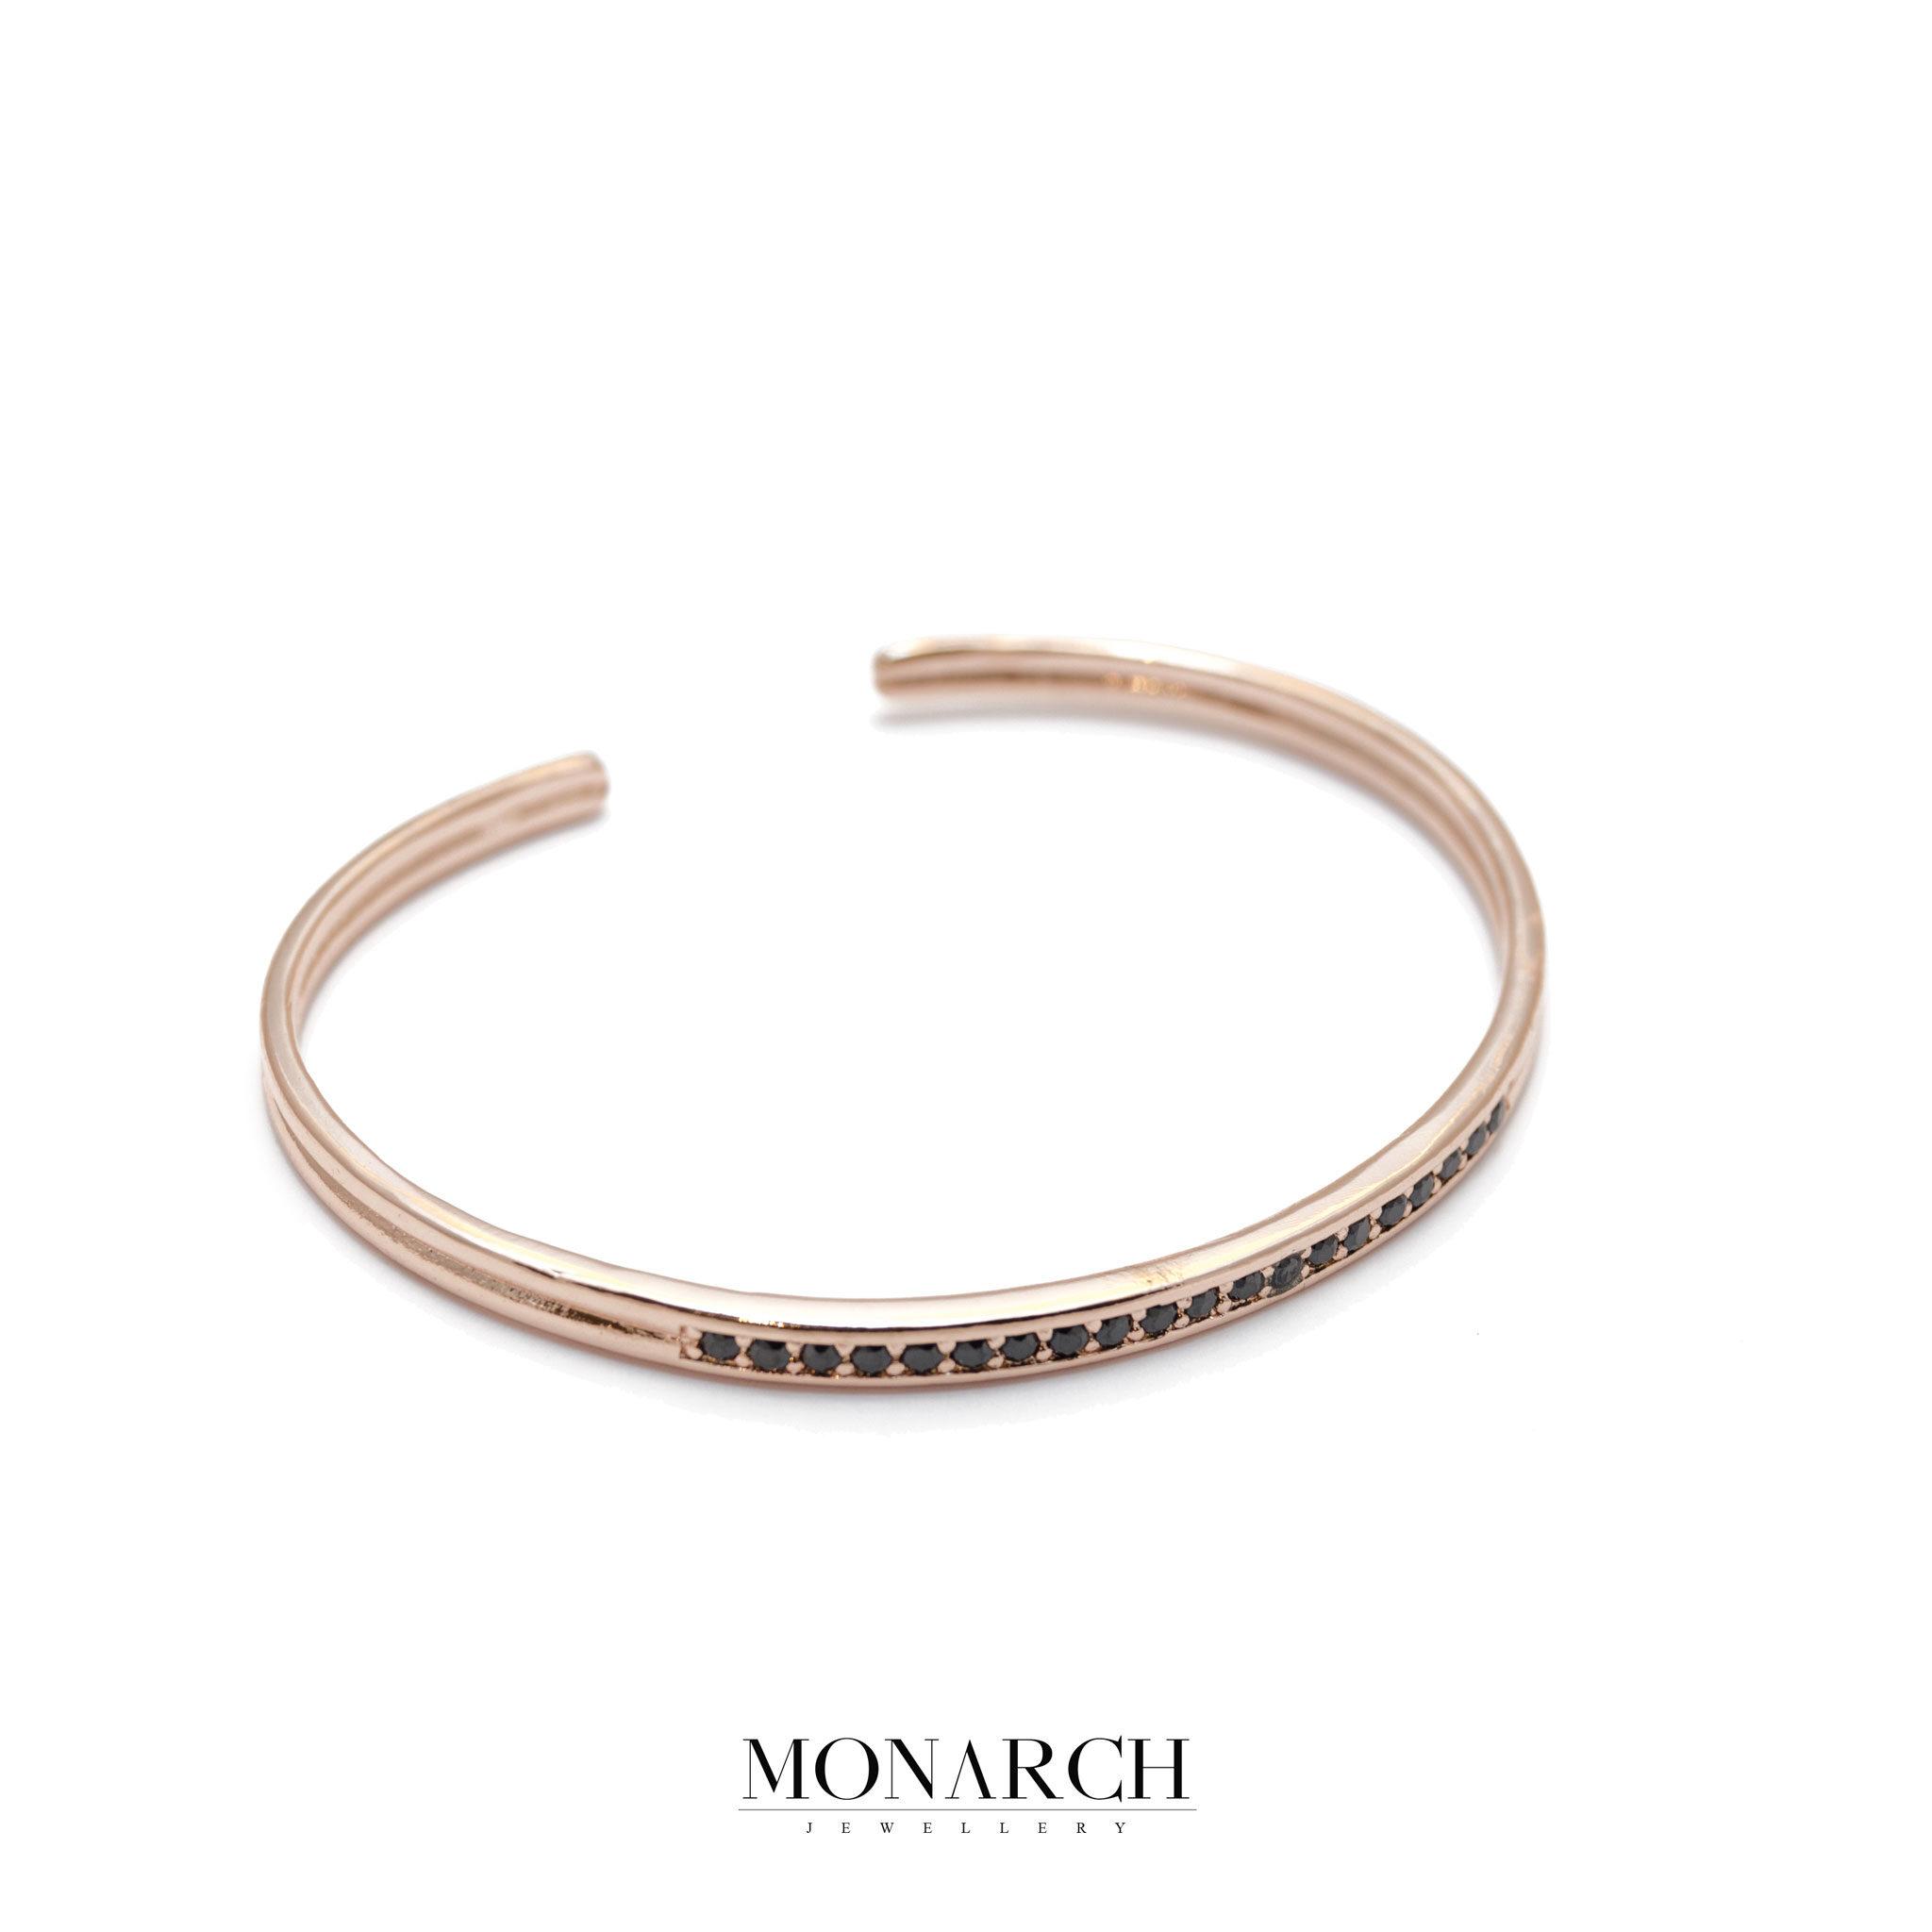 Monarch Jewellery Gold Rose Zircon Bangle Bracelet